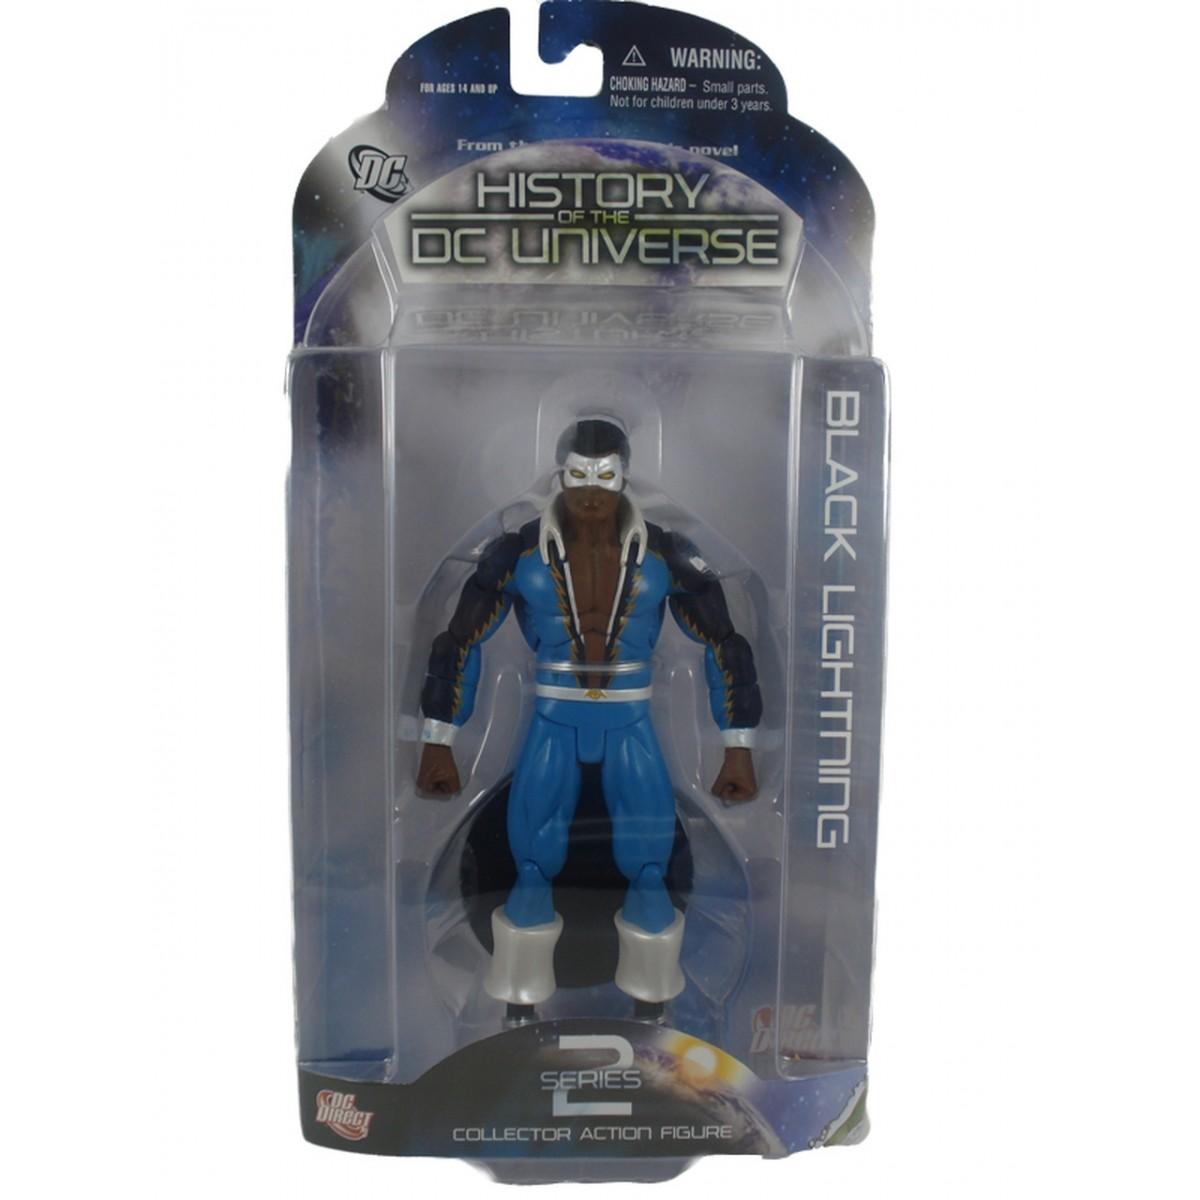 Boneco Raio Negro (Black Lightning): History of the DC Universe Series 2 - DC Direct